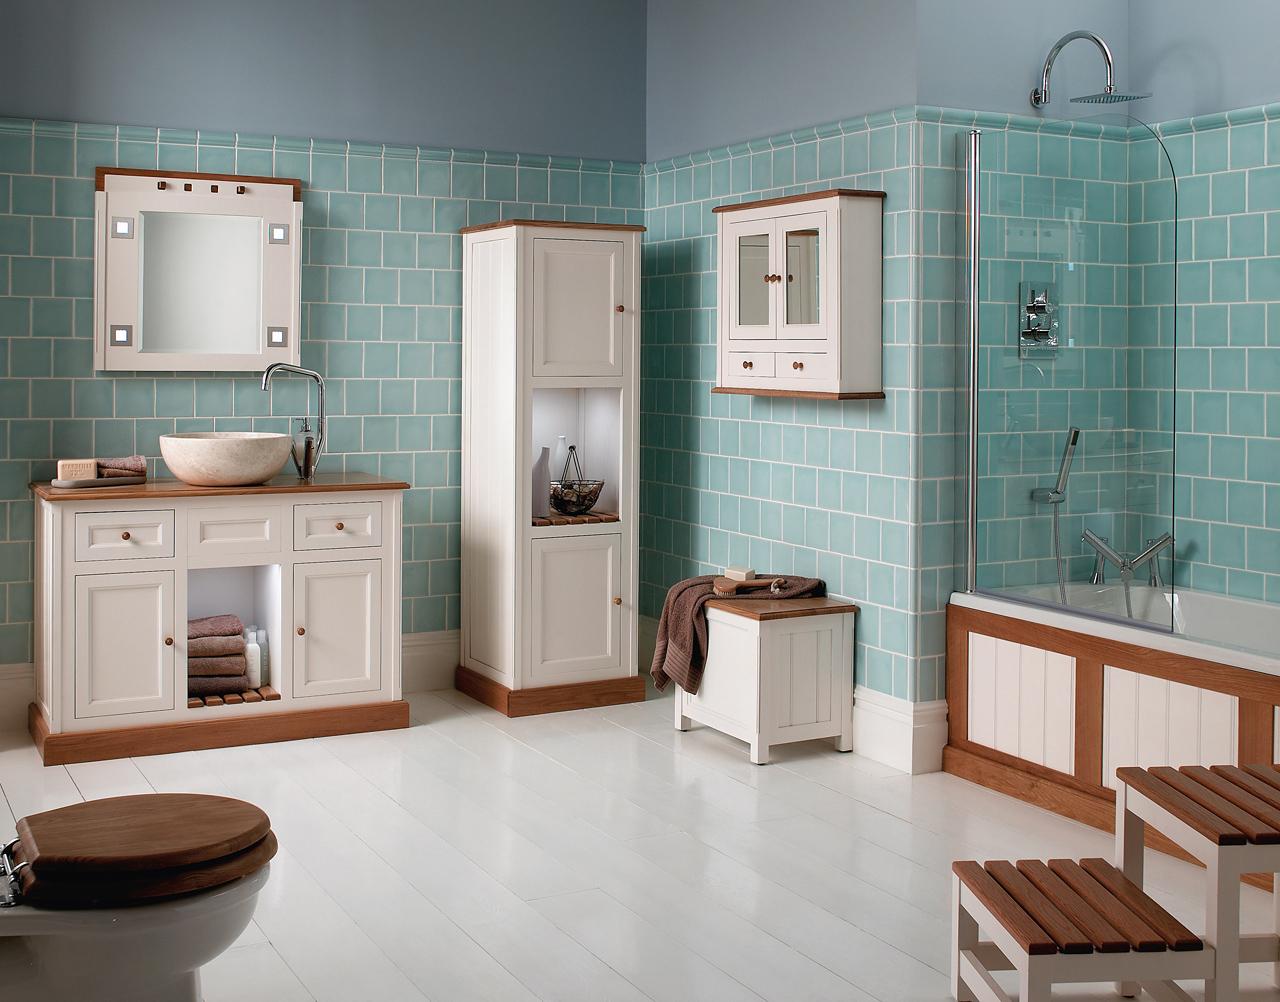 Classic Bathrooms: Imperial Bathrooms - Driftwood-main-final